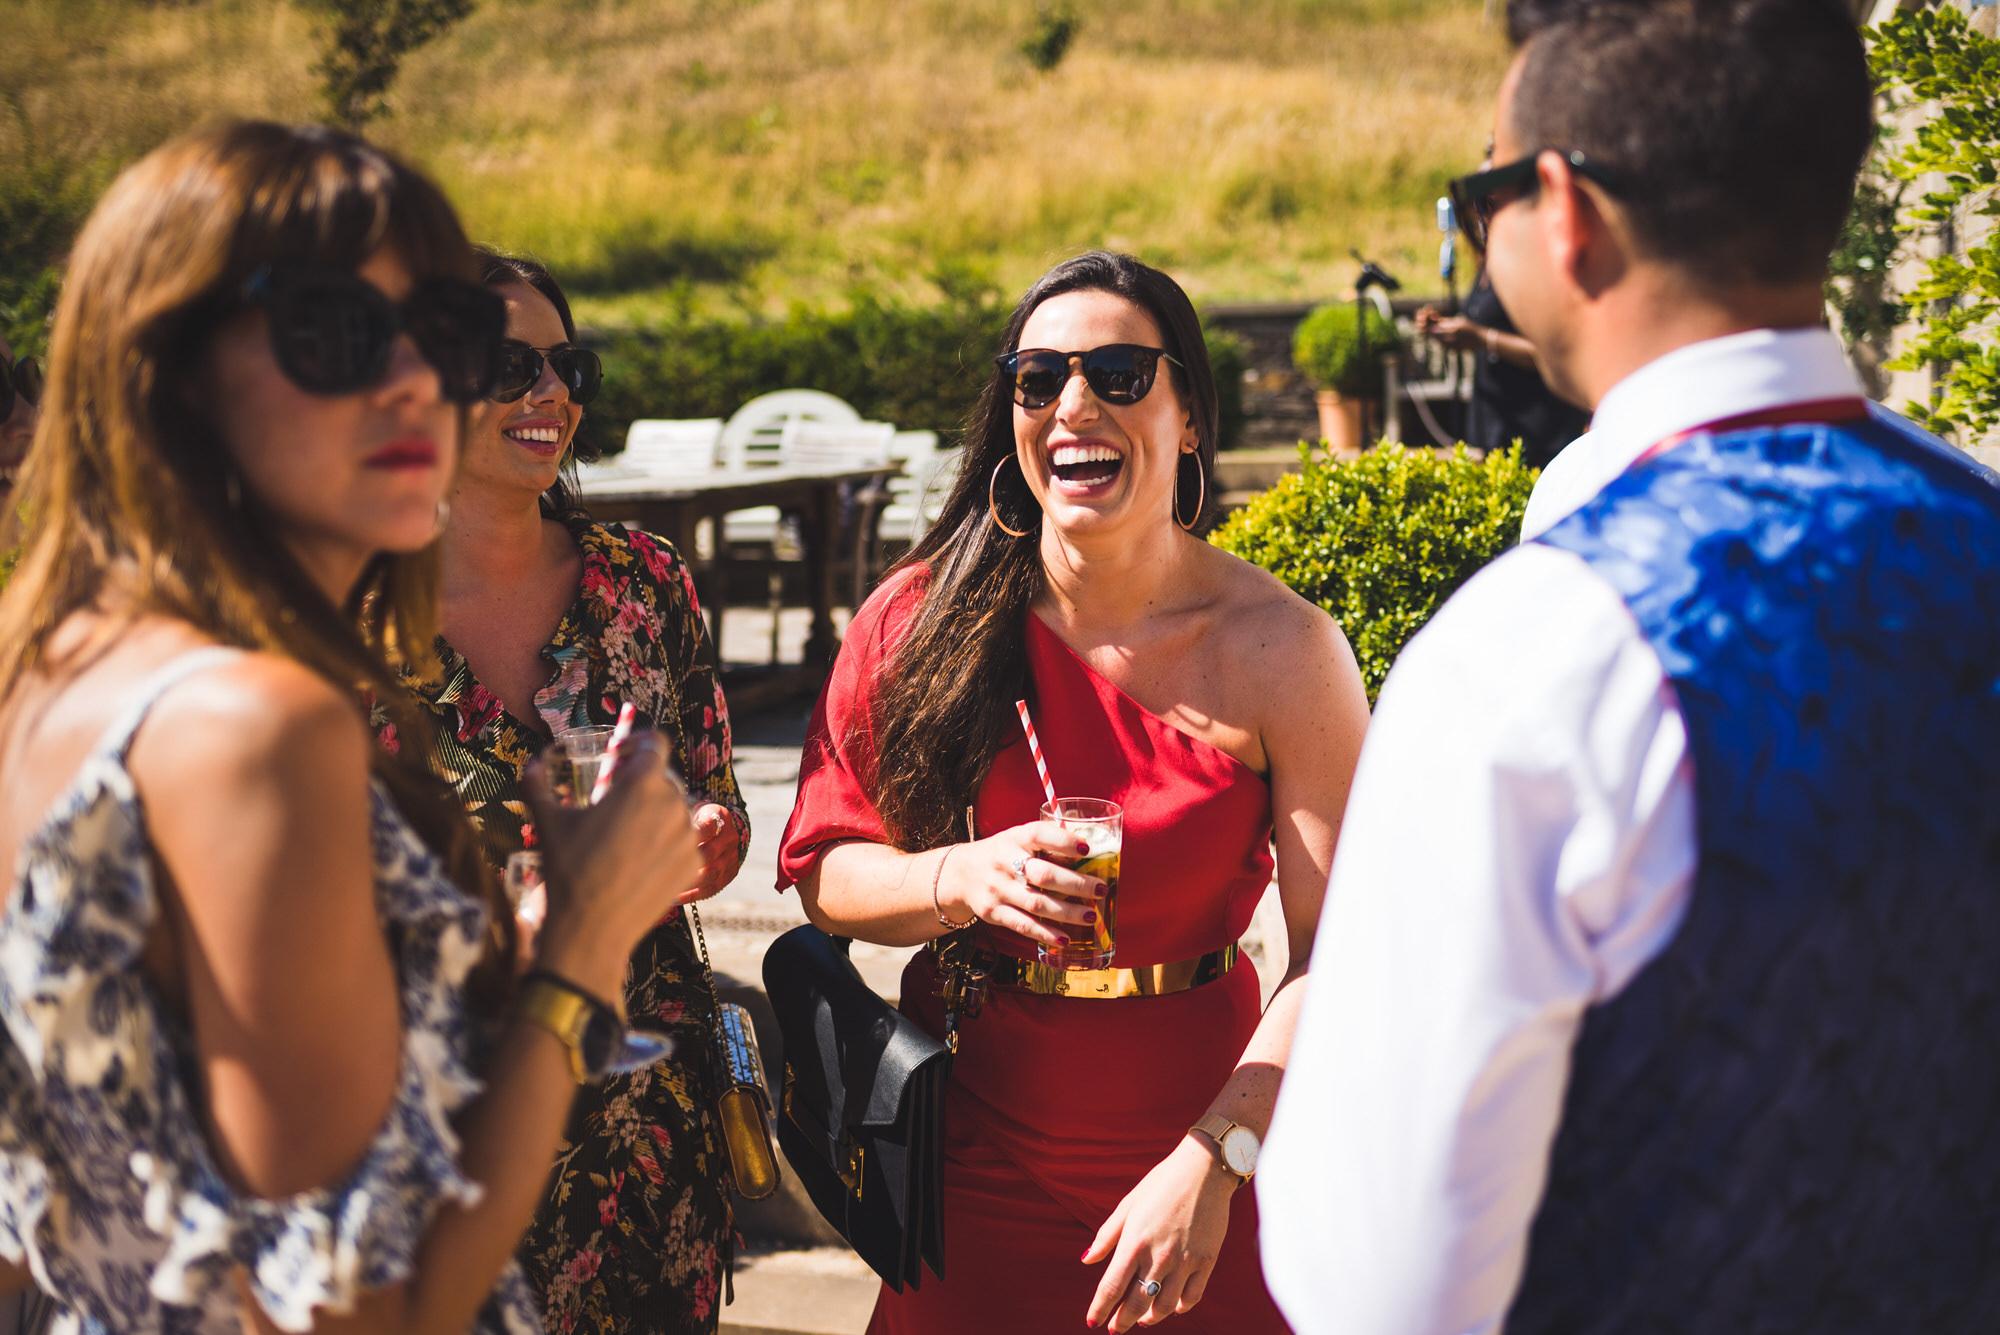 Shilstone wedding photographer 22